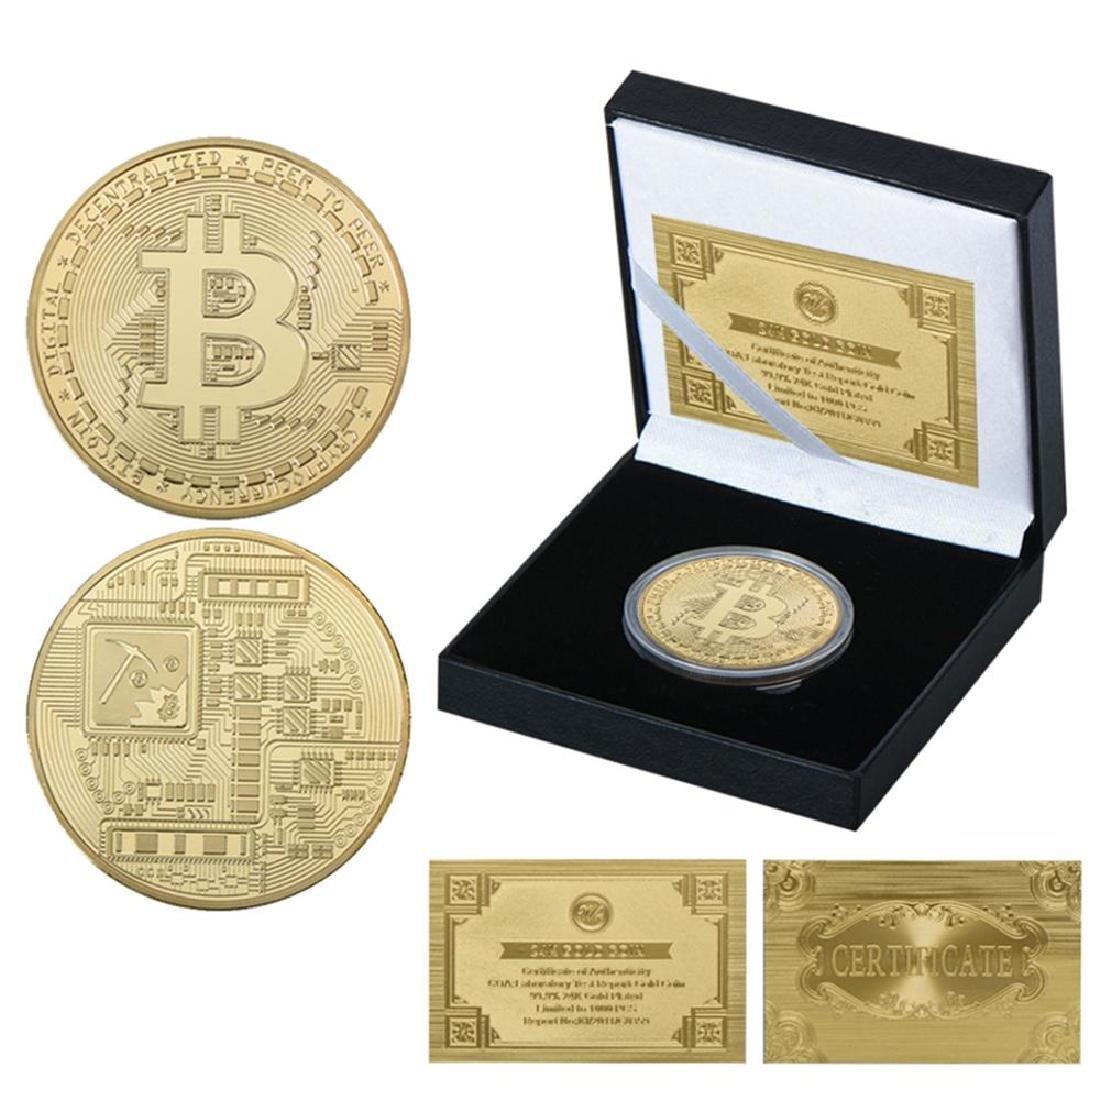 Bitcoin Mining Gold Clad Crypto Coin with COA